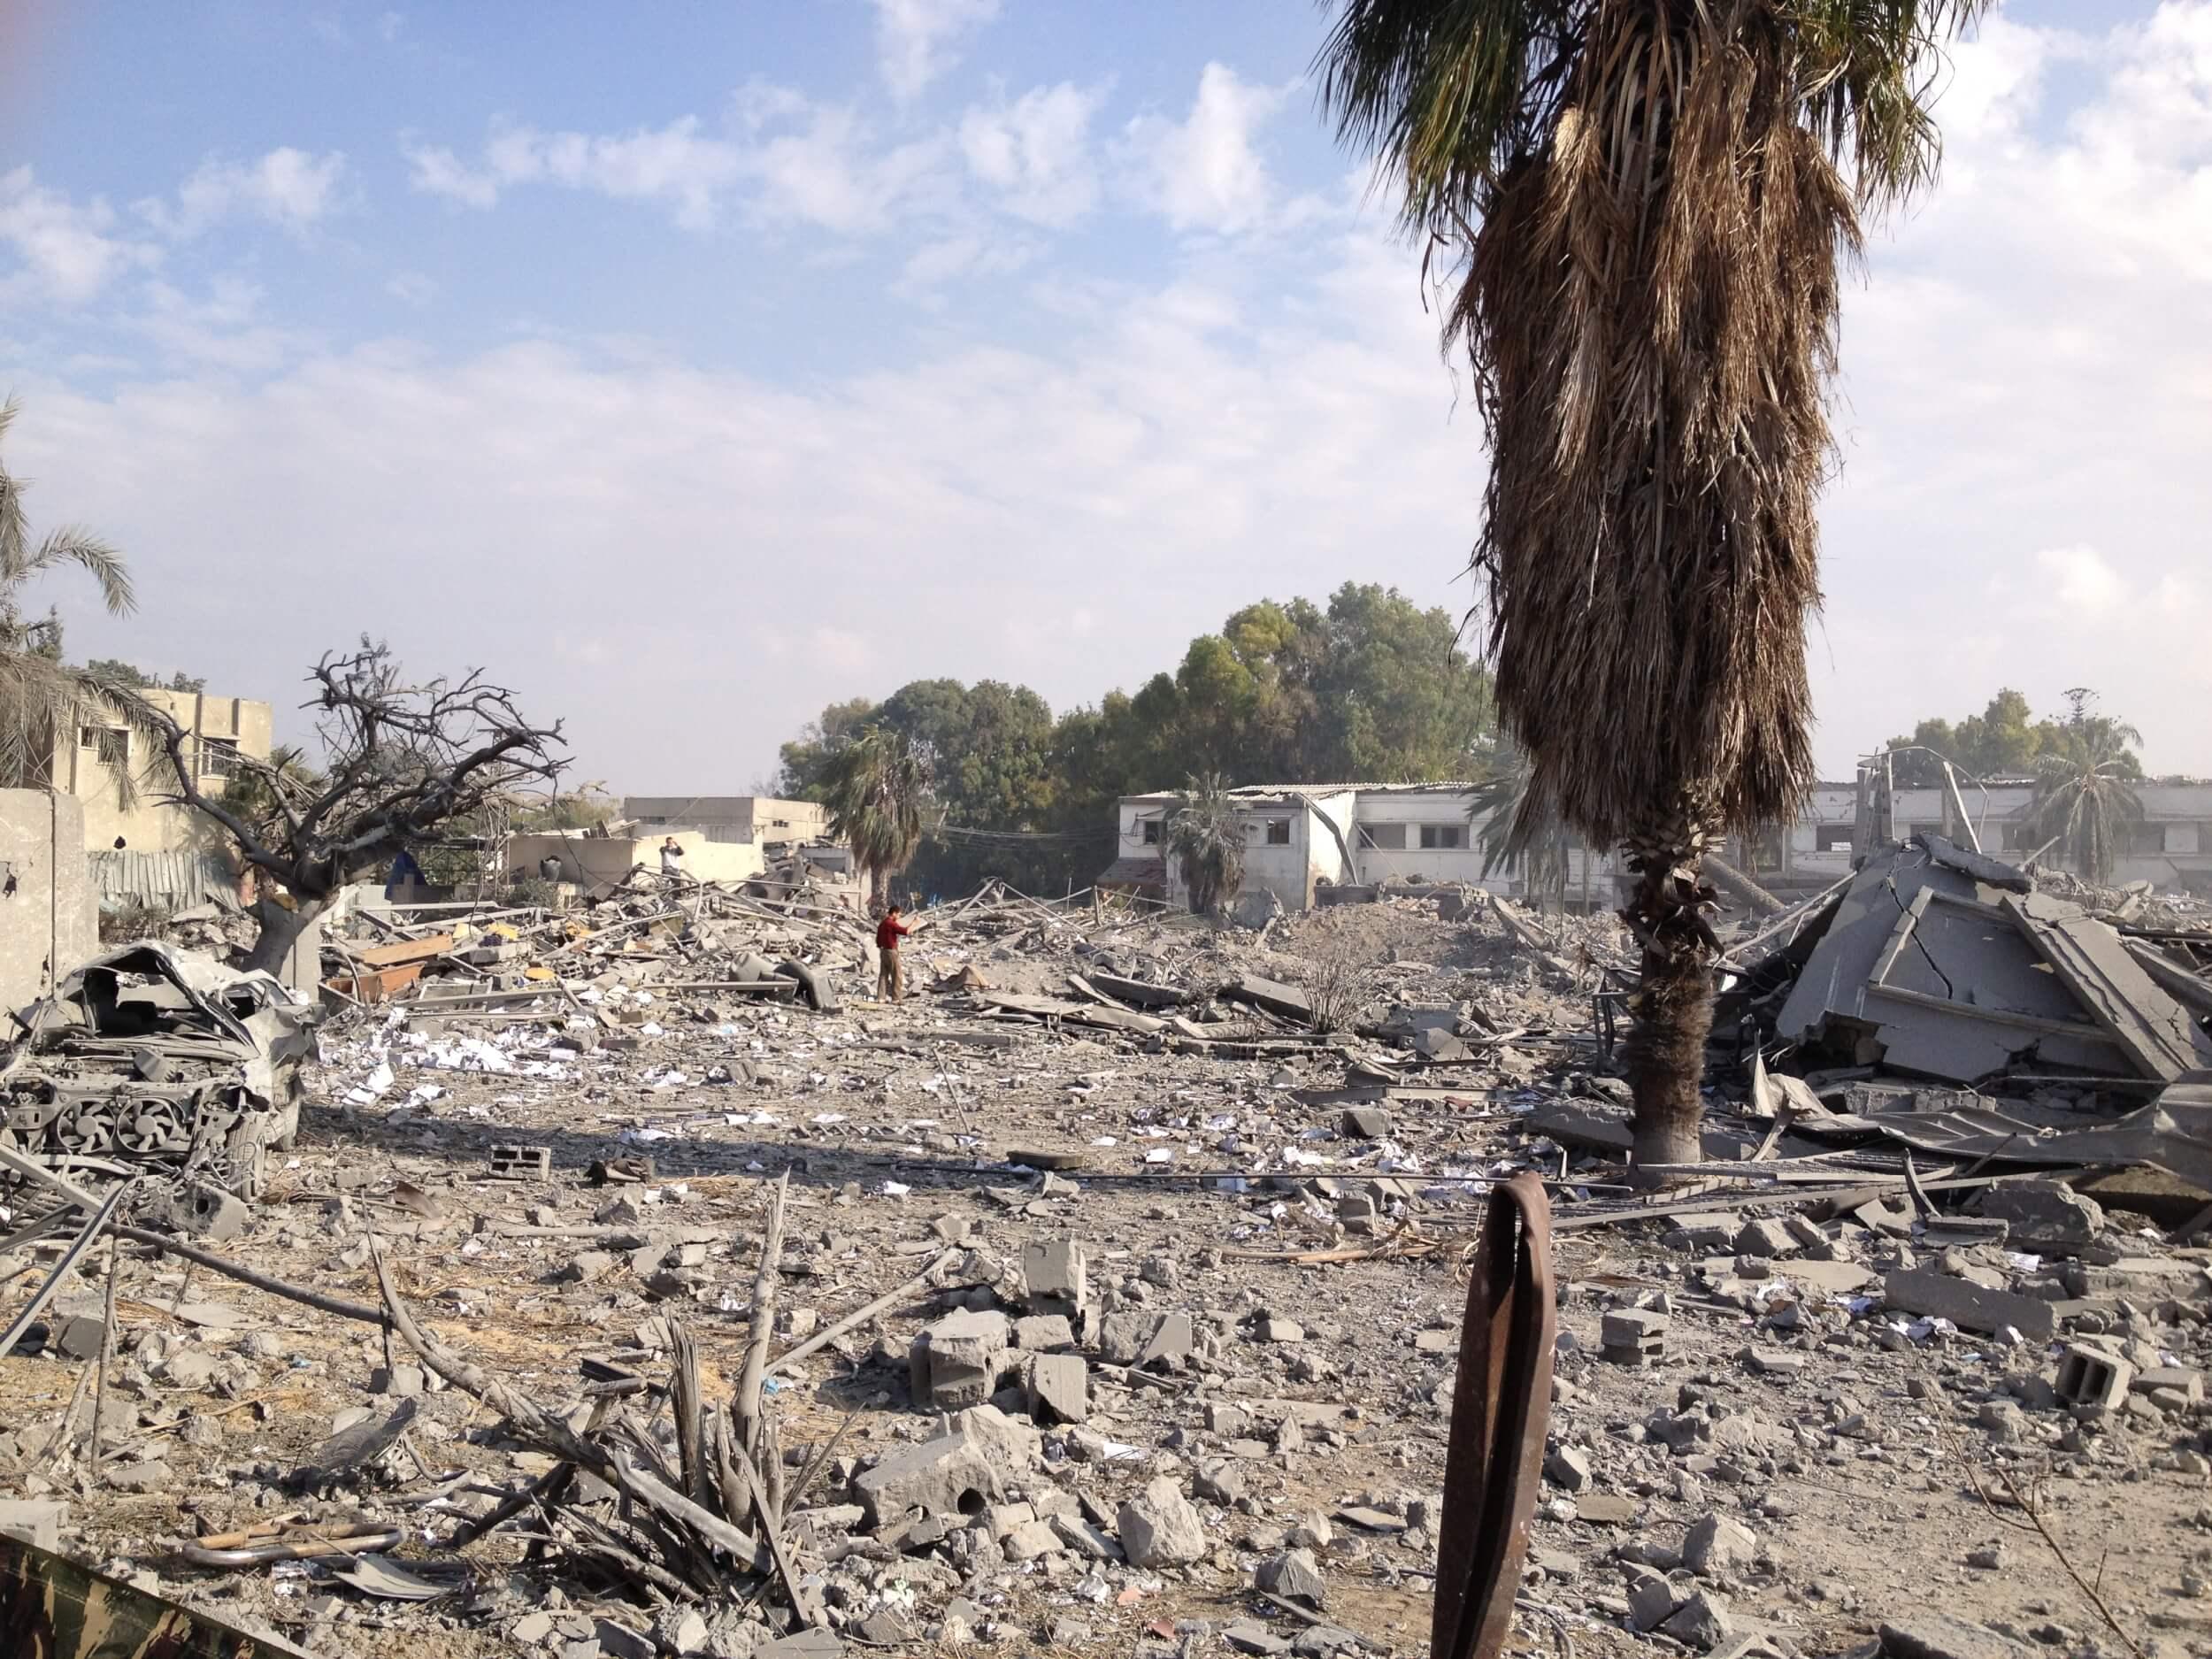 Reconstruction in Gaza has been slower than anticipated. (Photo: Isra Saleh El-Namy)